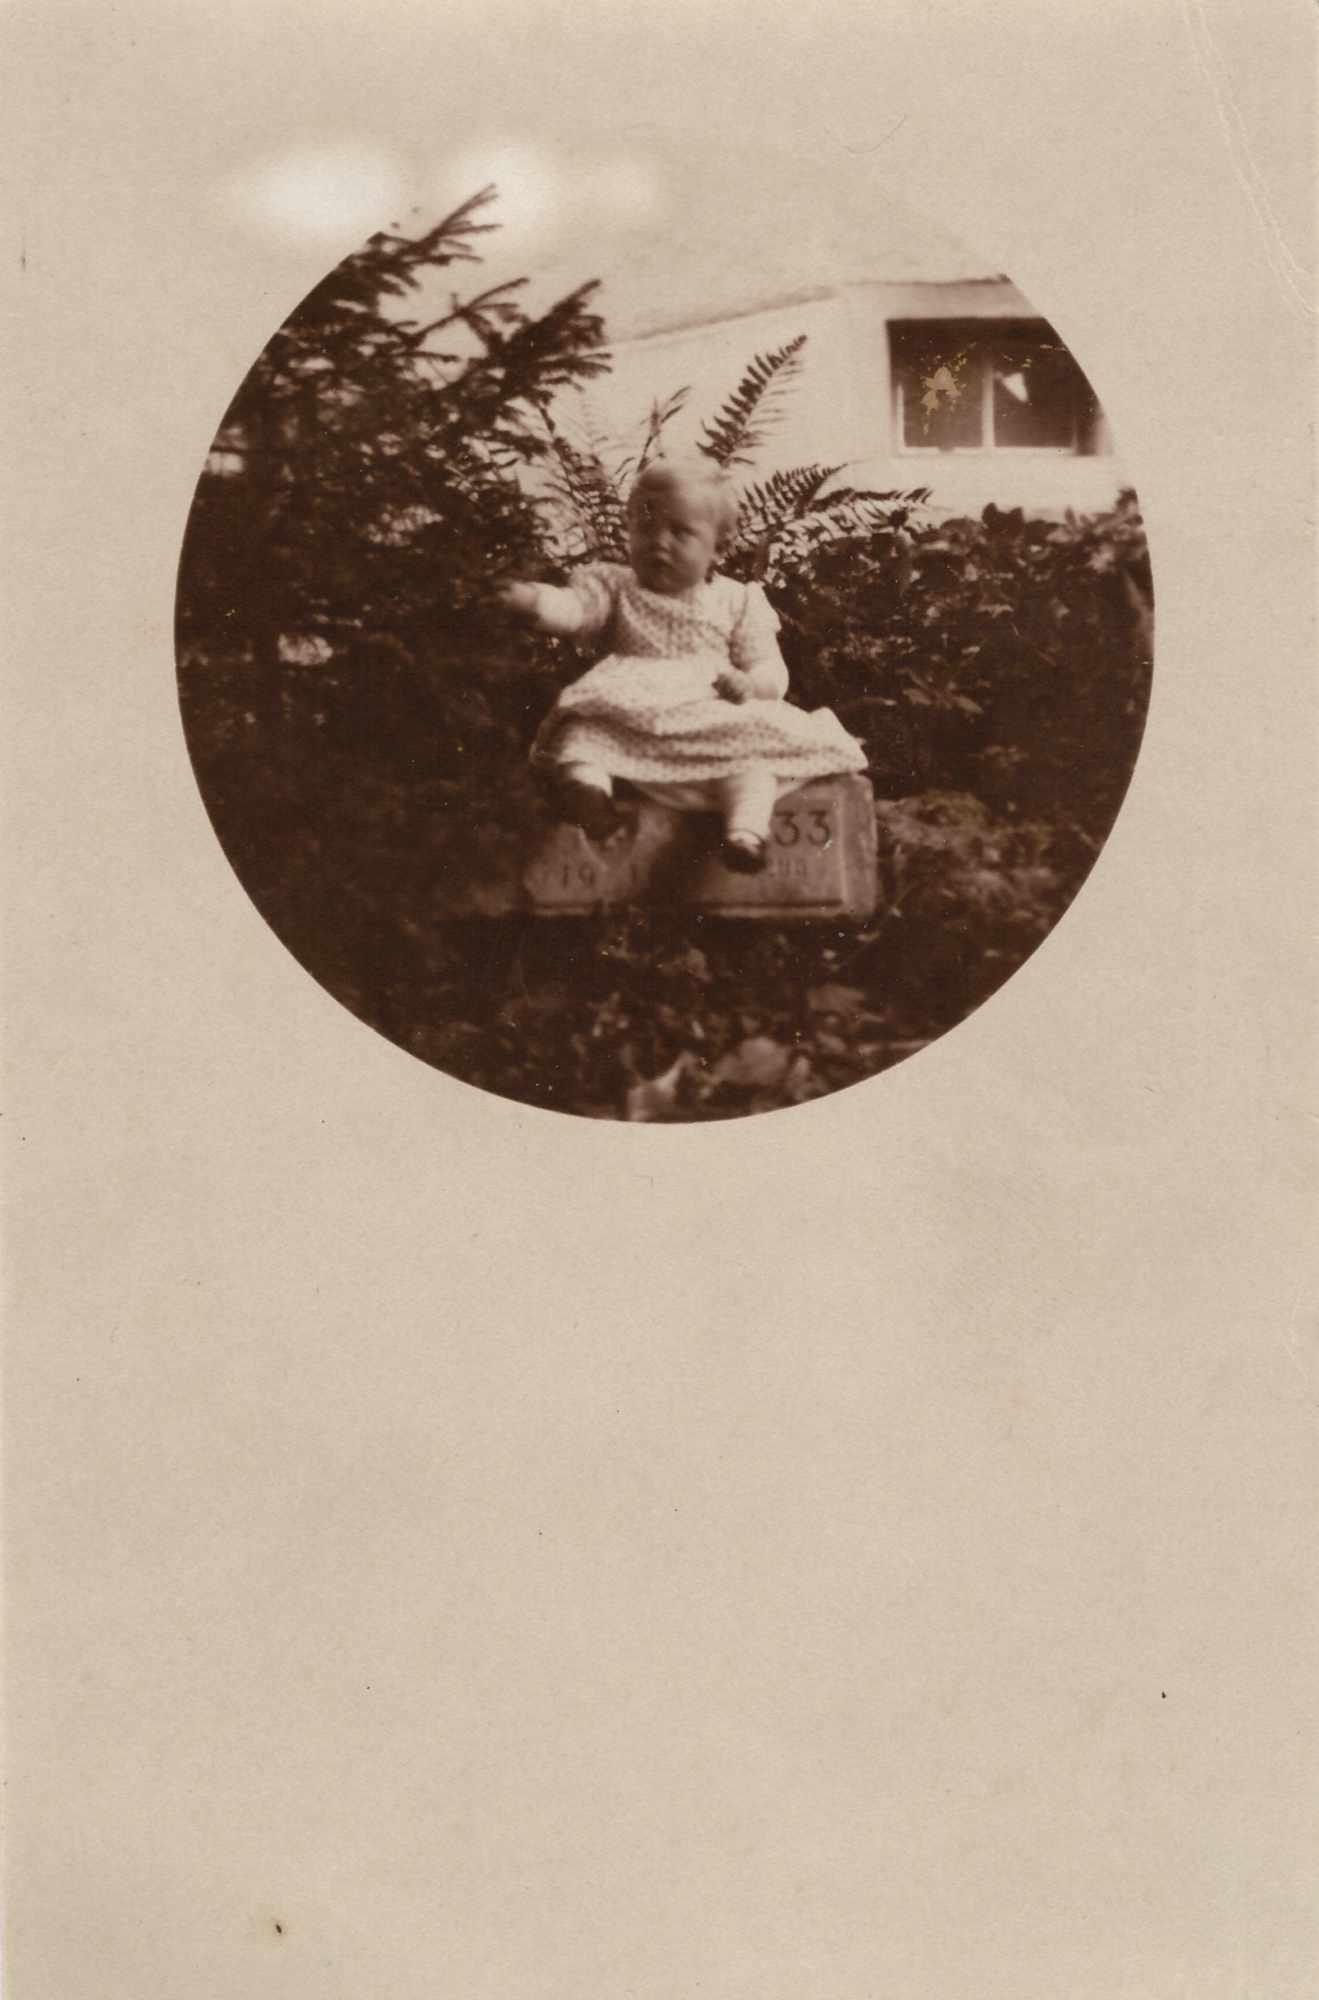 Bild: Kleinkind, ev. Gertrud Gürtler